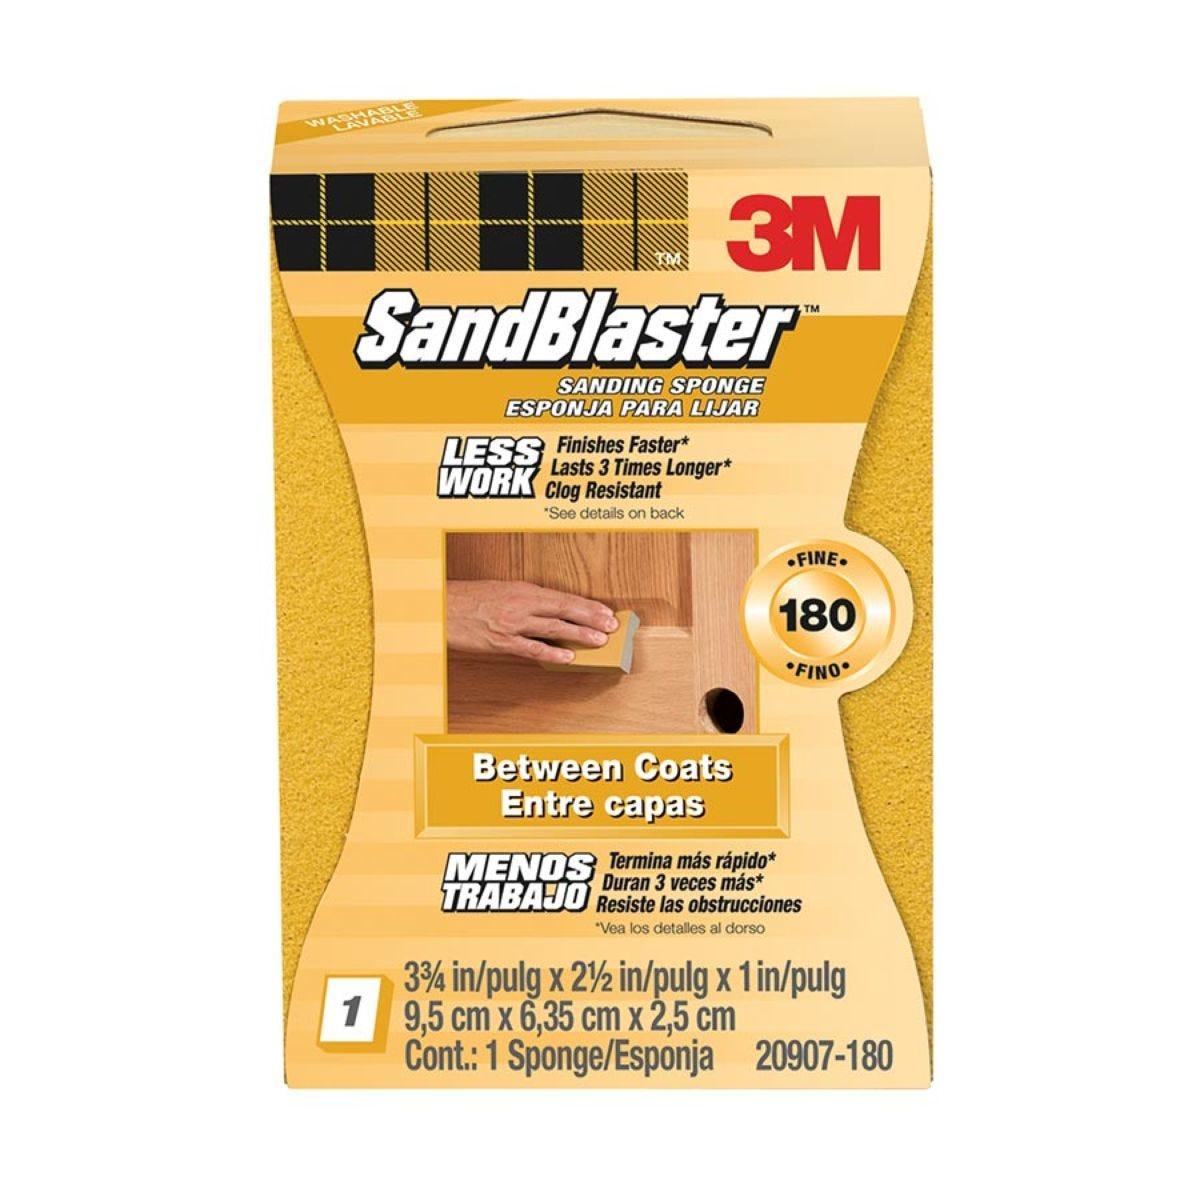 3M SandBlaster Dual Angle Sanding Sponge - Fine P180